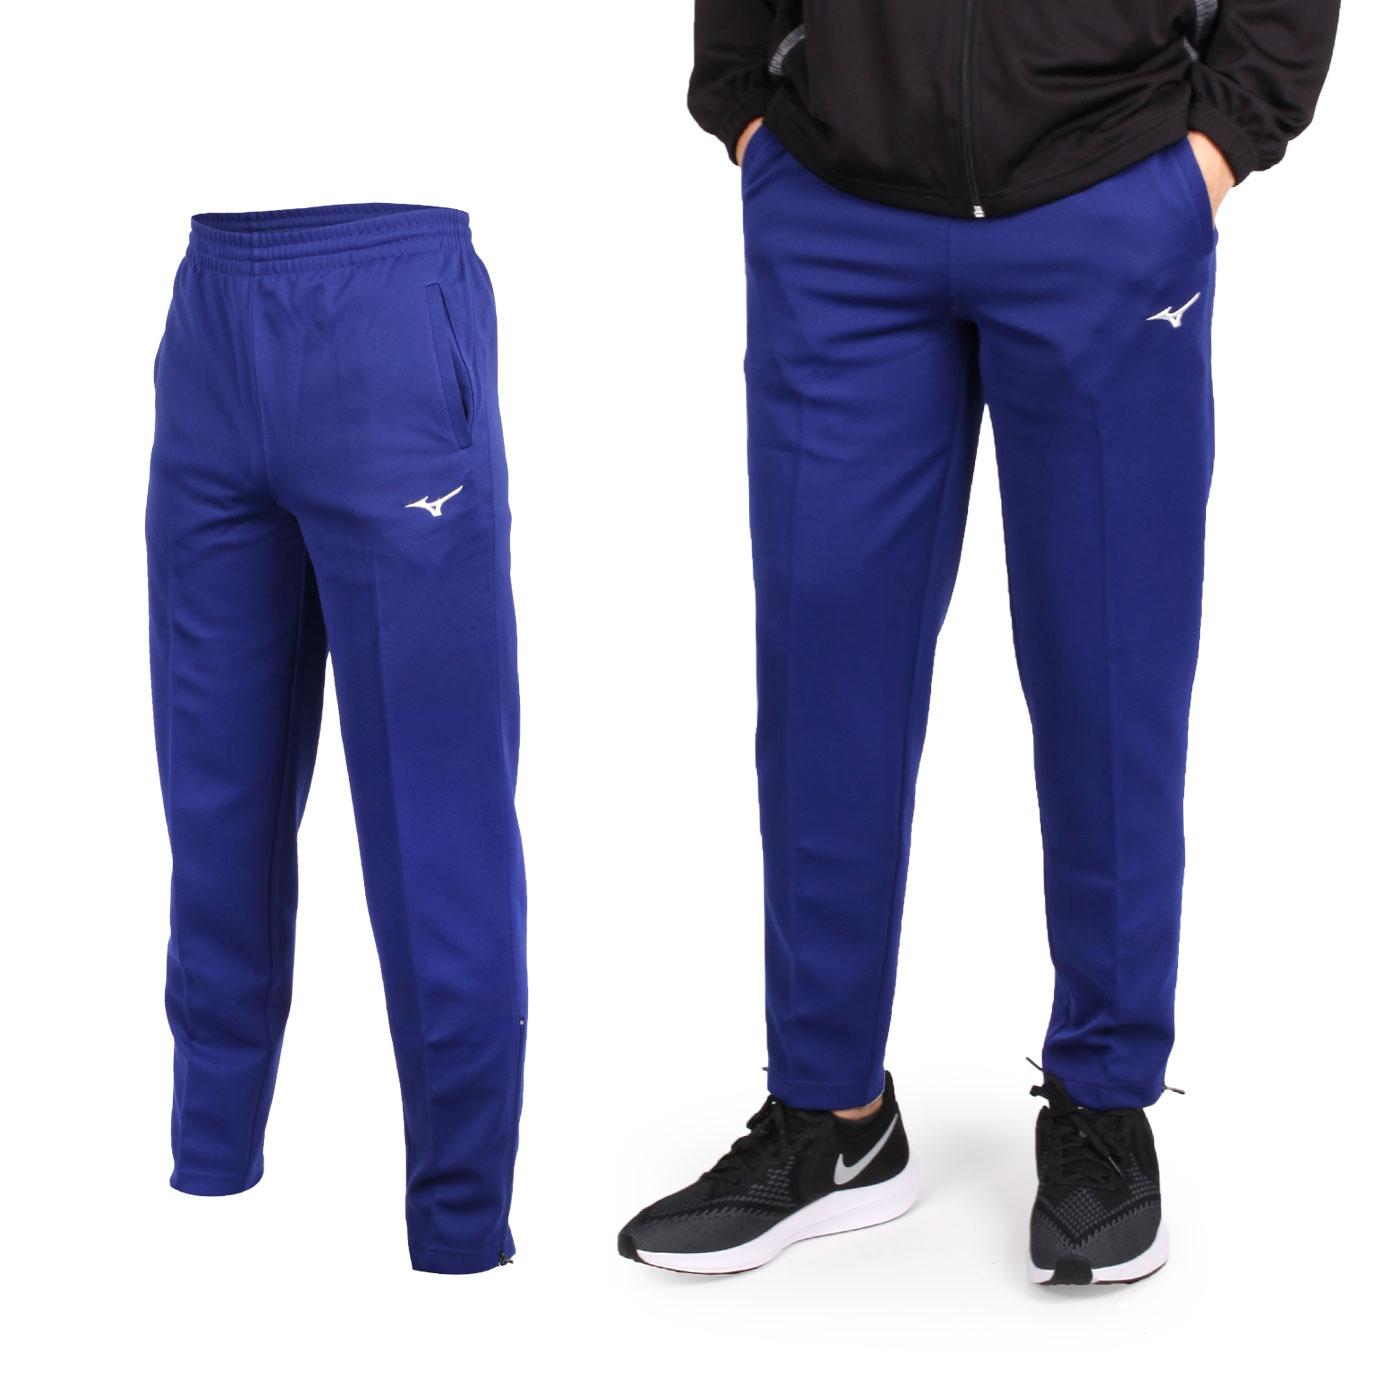 MIZUNO 男款針織長褲 32TD8A3609 - 藍白